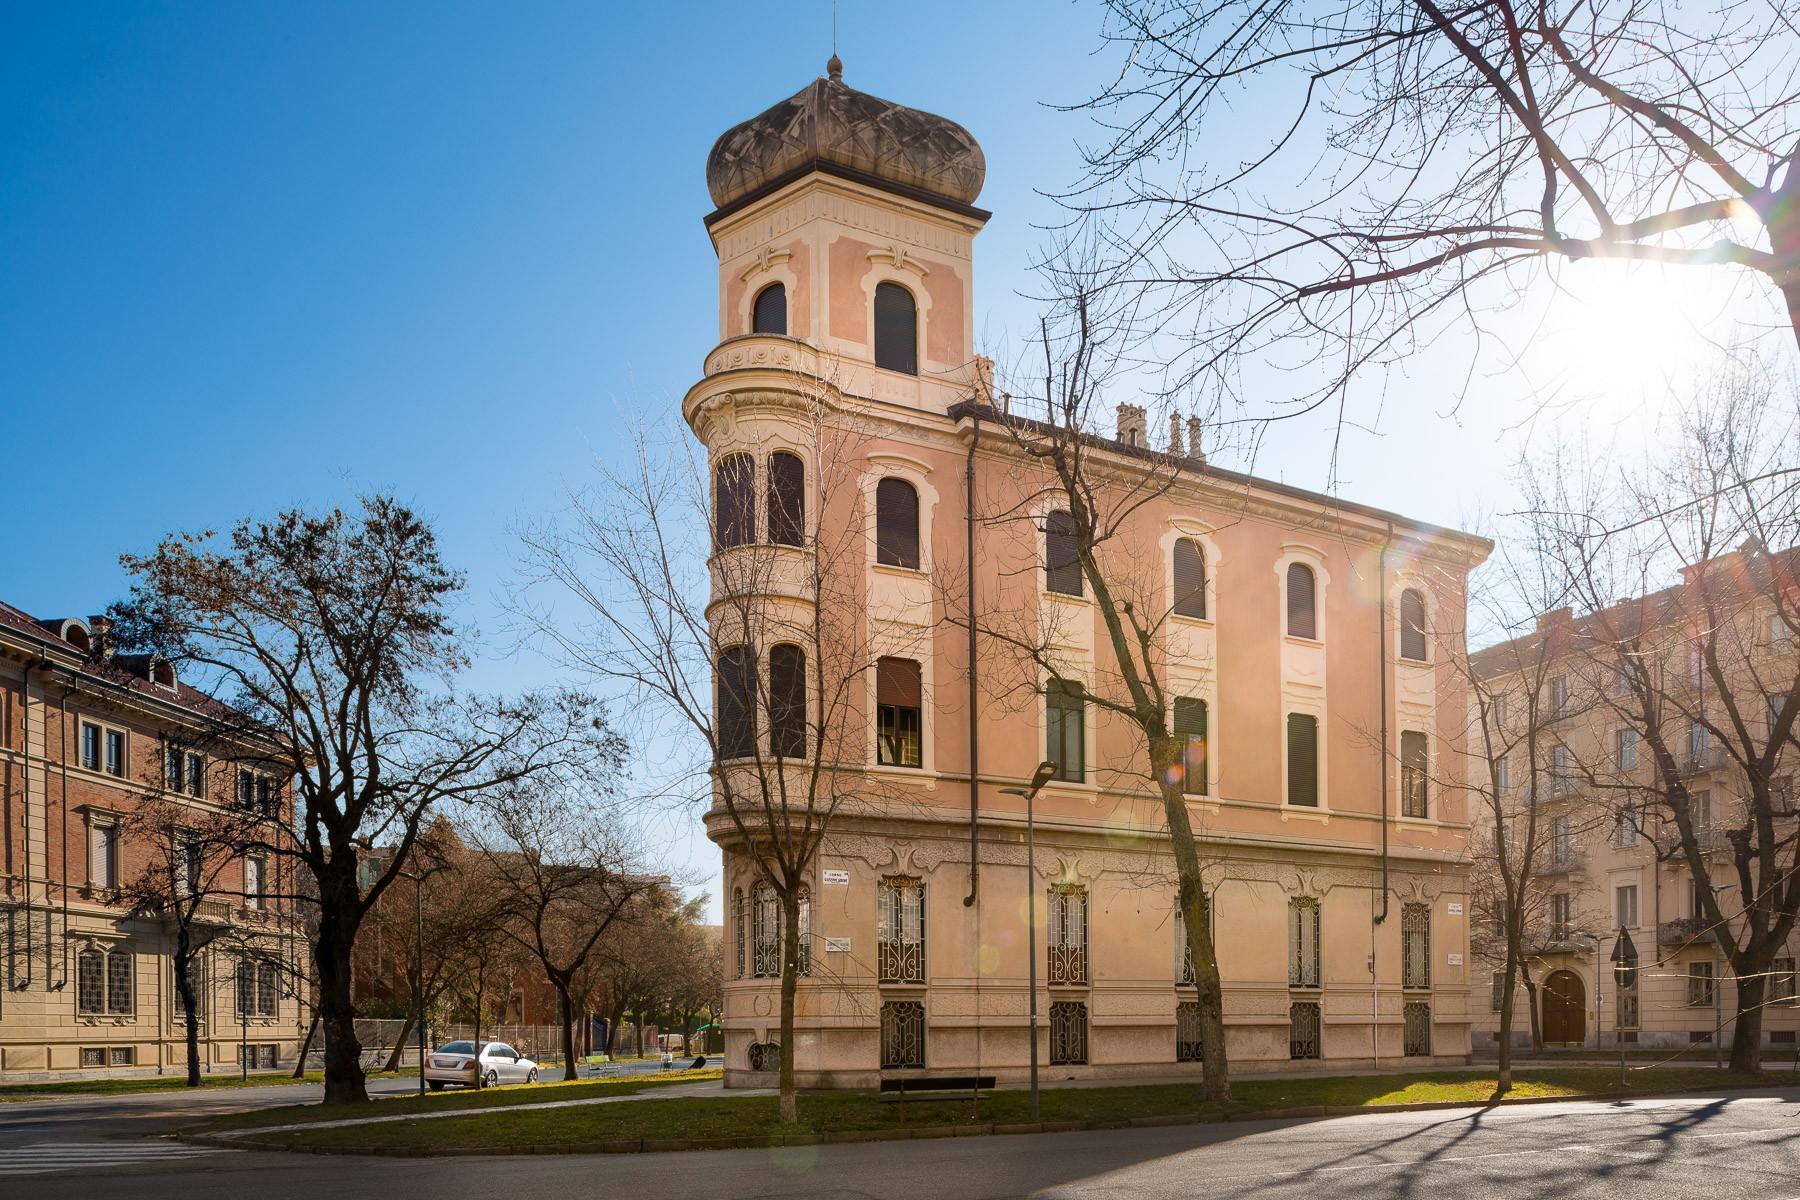 Appartement de prestige dans une villa de style néo baroque - 2